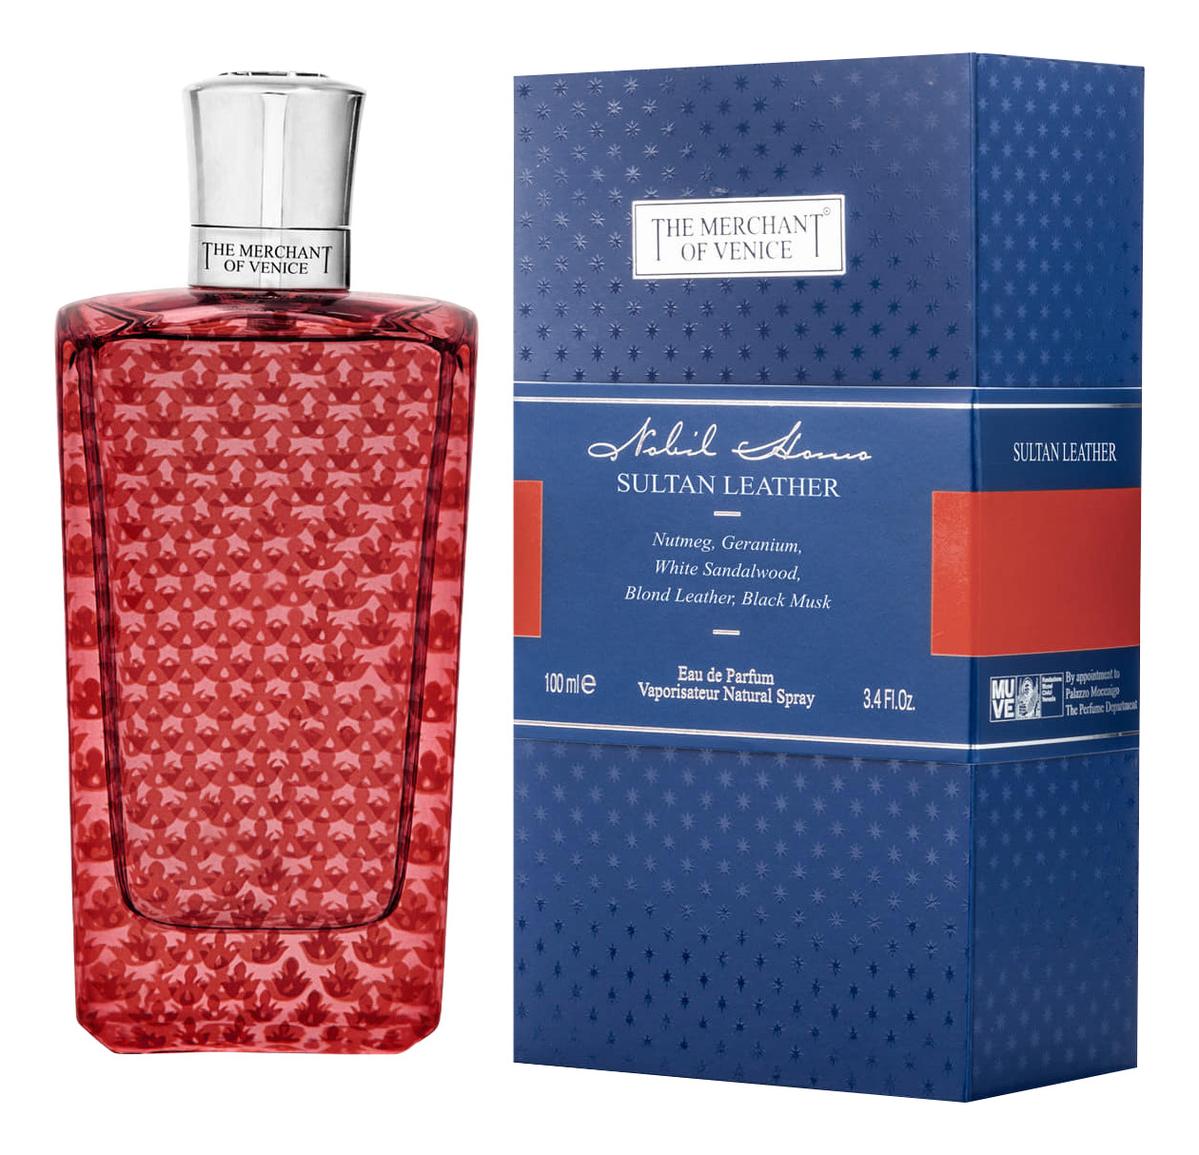 Фото - The Merchant Of Venice Sultan Leather: парфюмерная вода 100мл the merchant of venice mandarin carnival eau de parfum